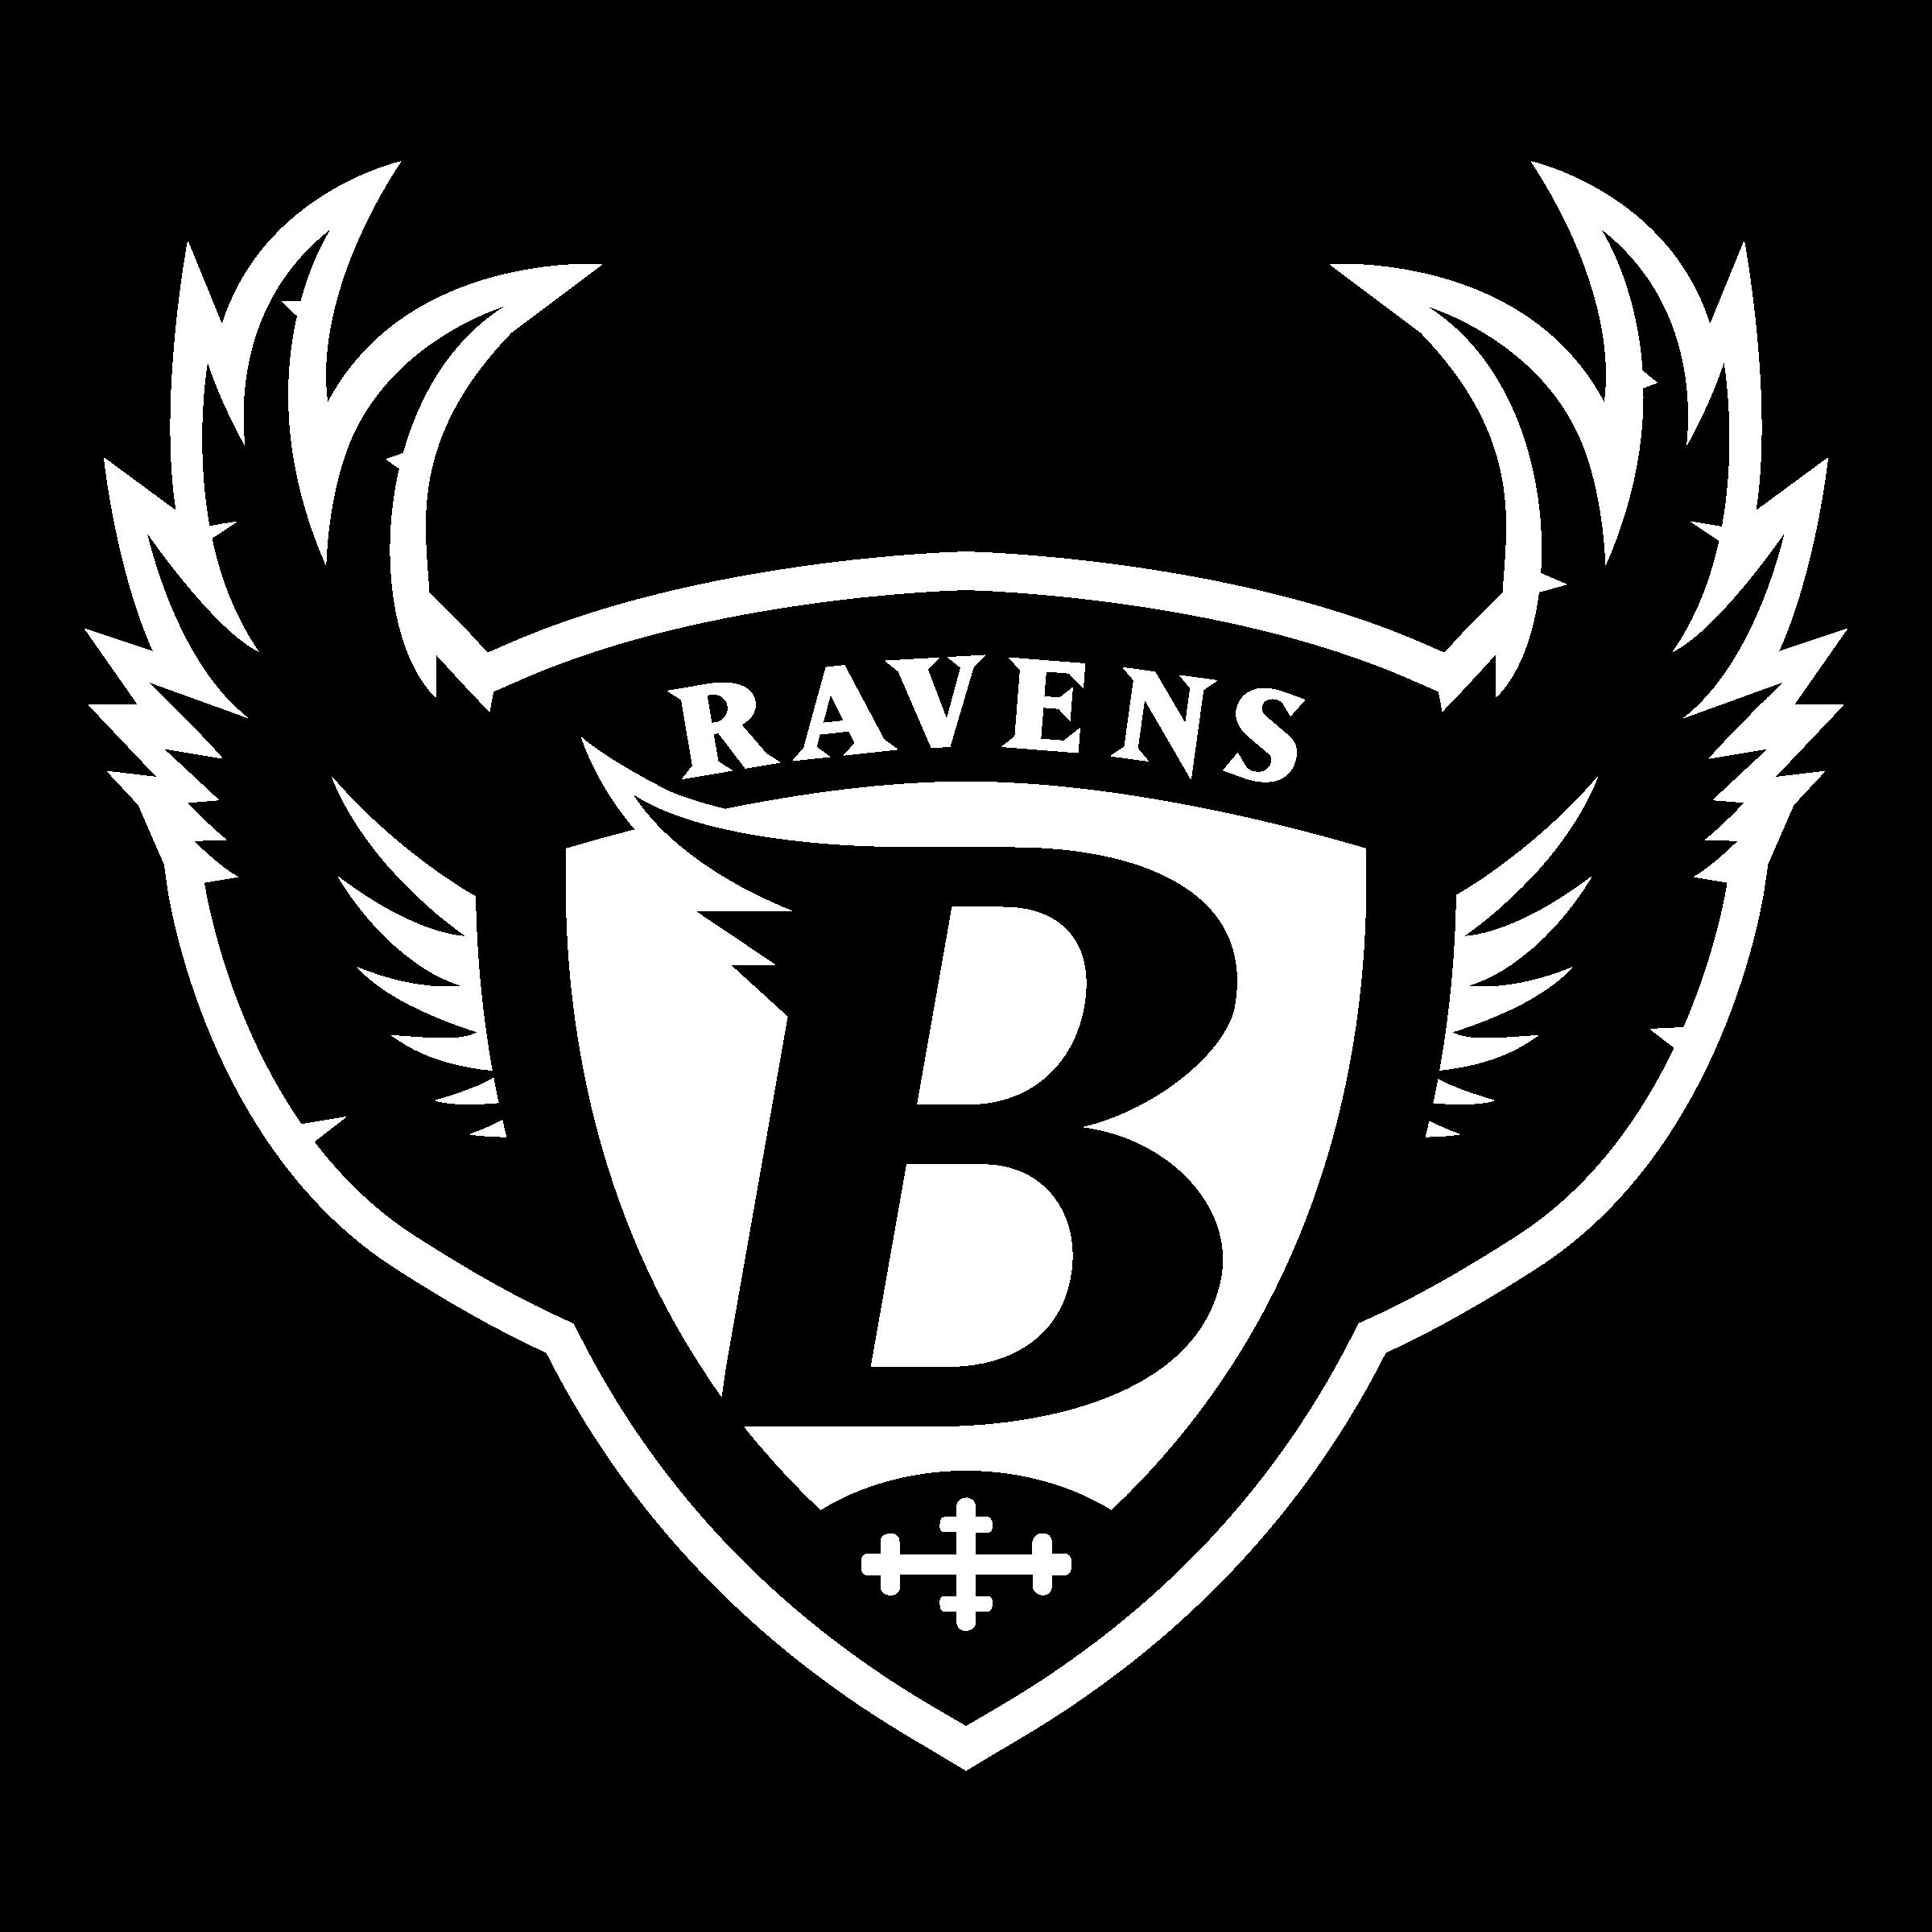 1996 Baltimore Ravens season 2012 Baltimore Ravens season.